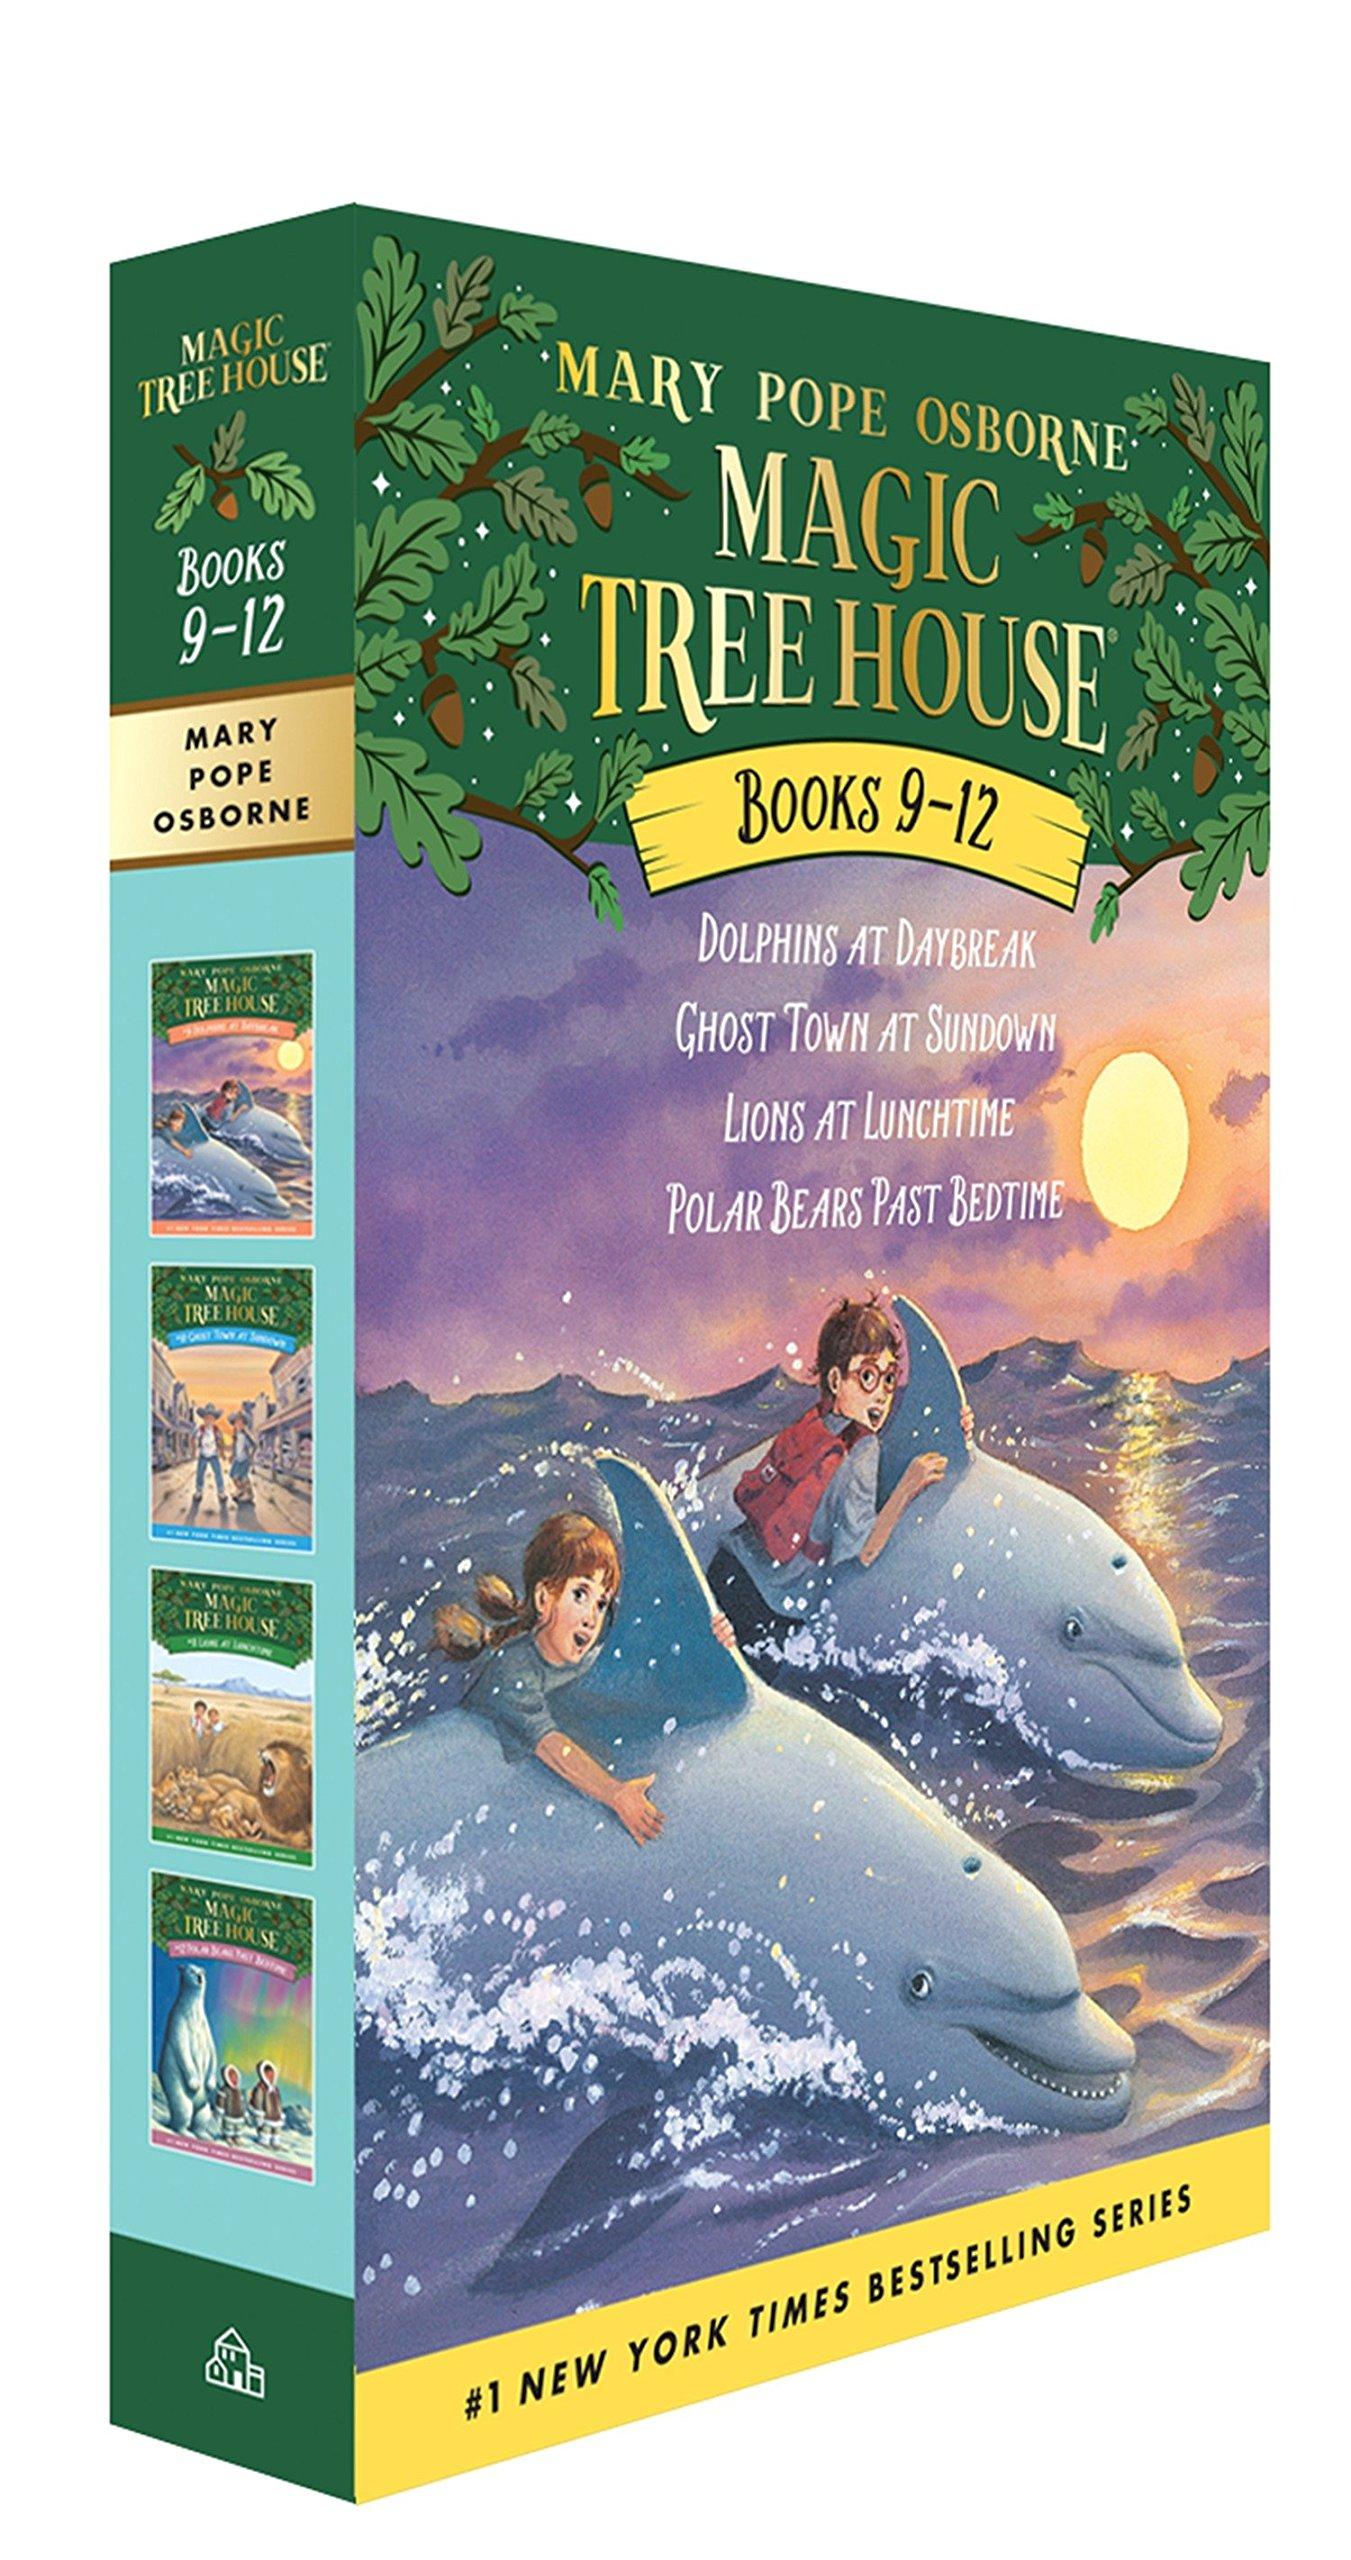 Magic Tree House Boxed Books product image